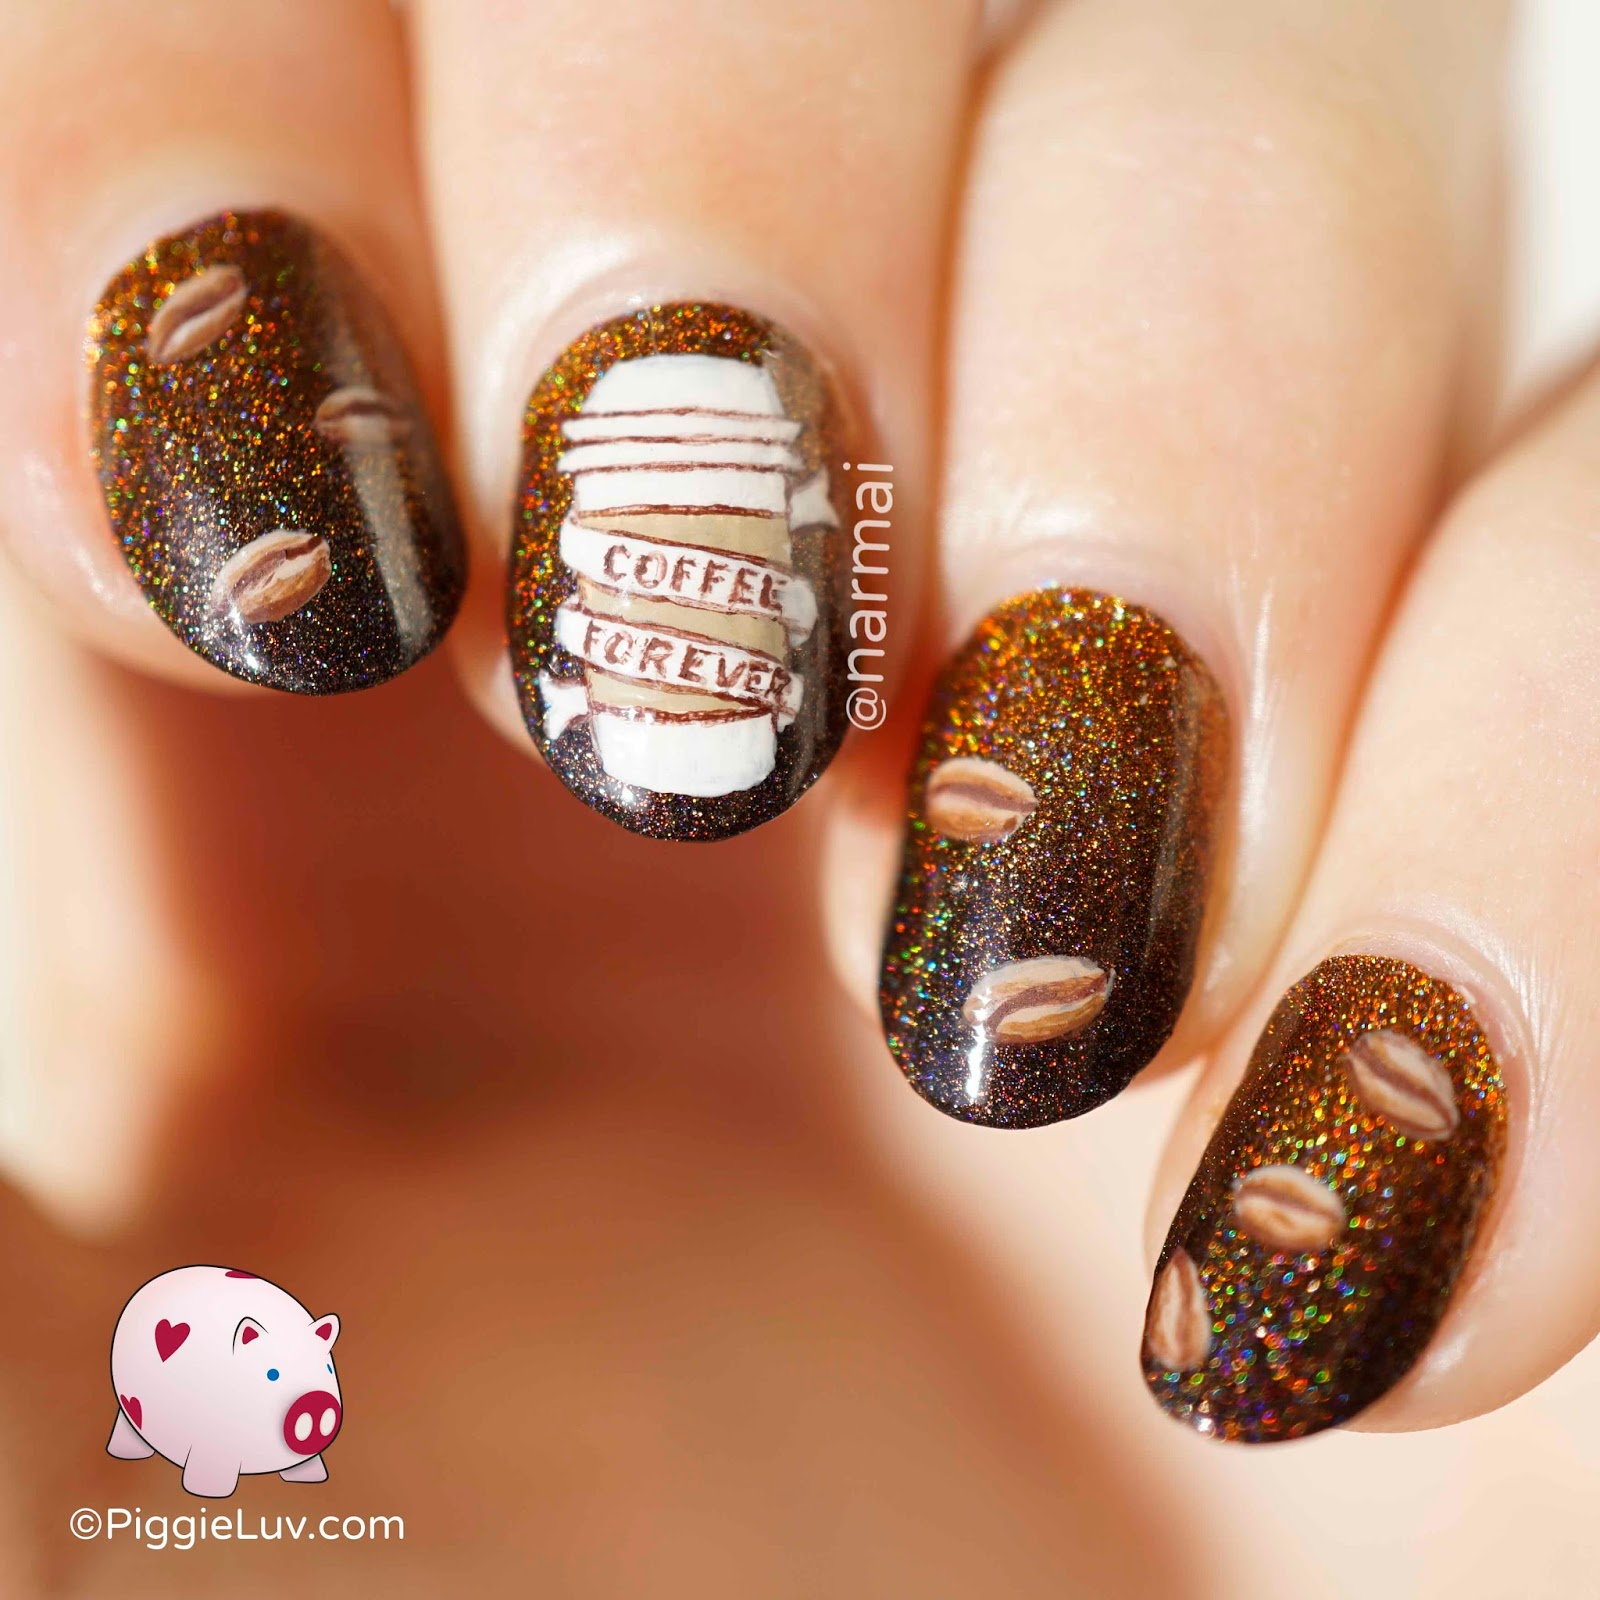 Piggieluv Coffee Forever Nail Art